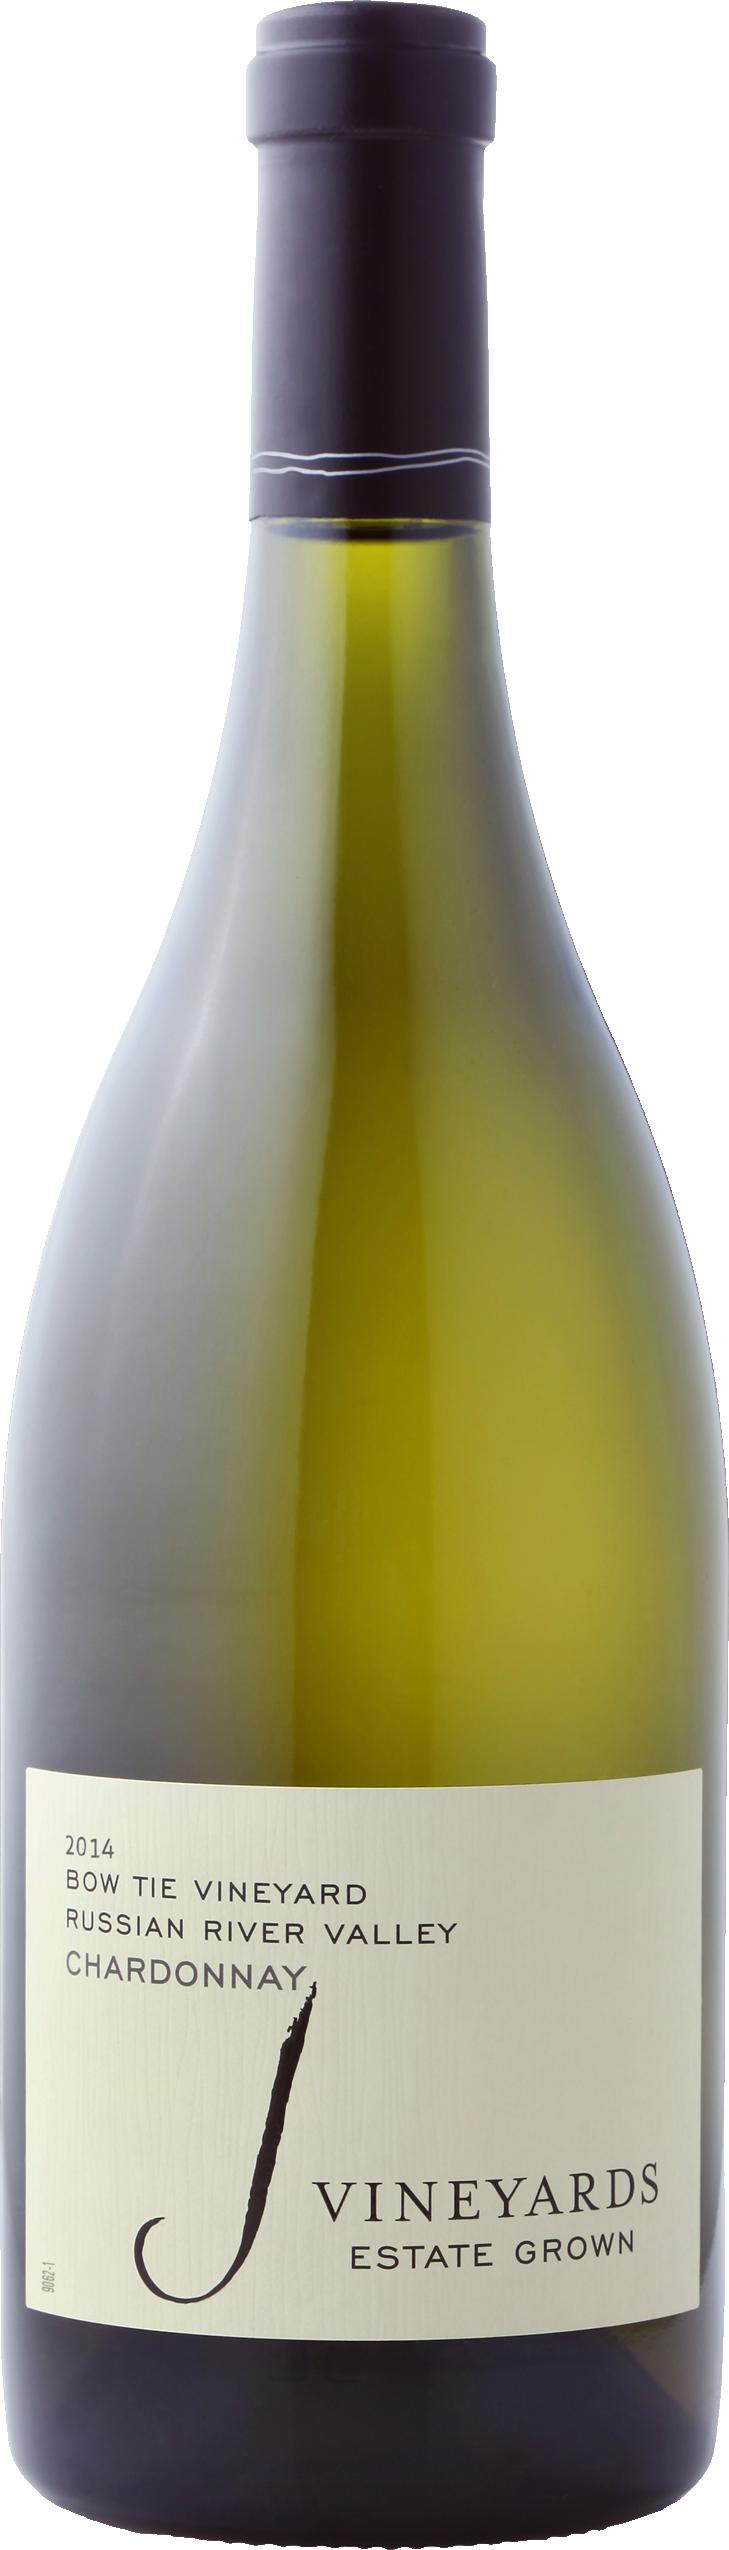 2014 J Chardonnay, Bow Tie Vineyard